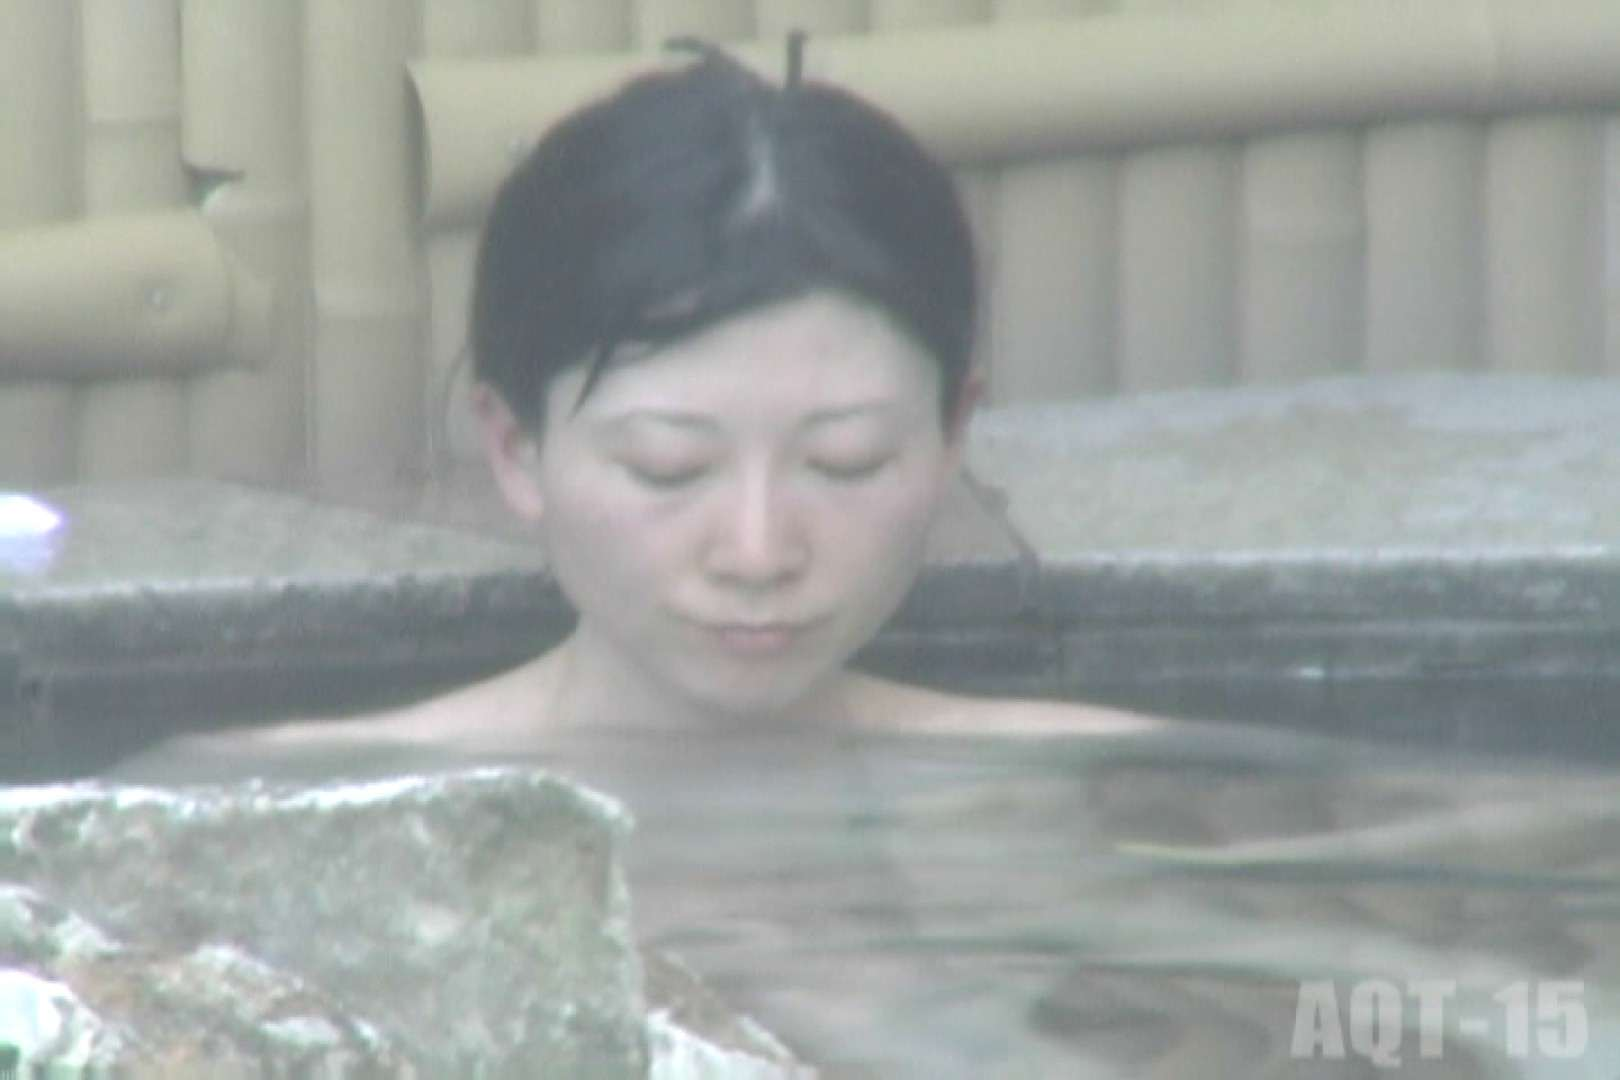 Aquaな露天風呂Vol.835 盗撮 | HなOL  73pic 30